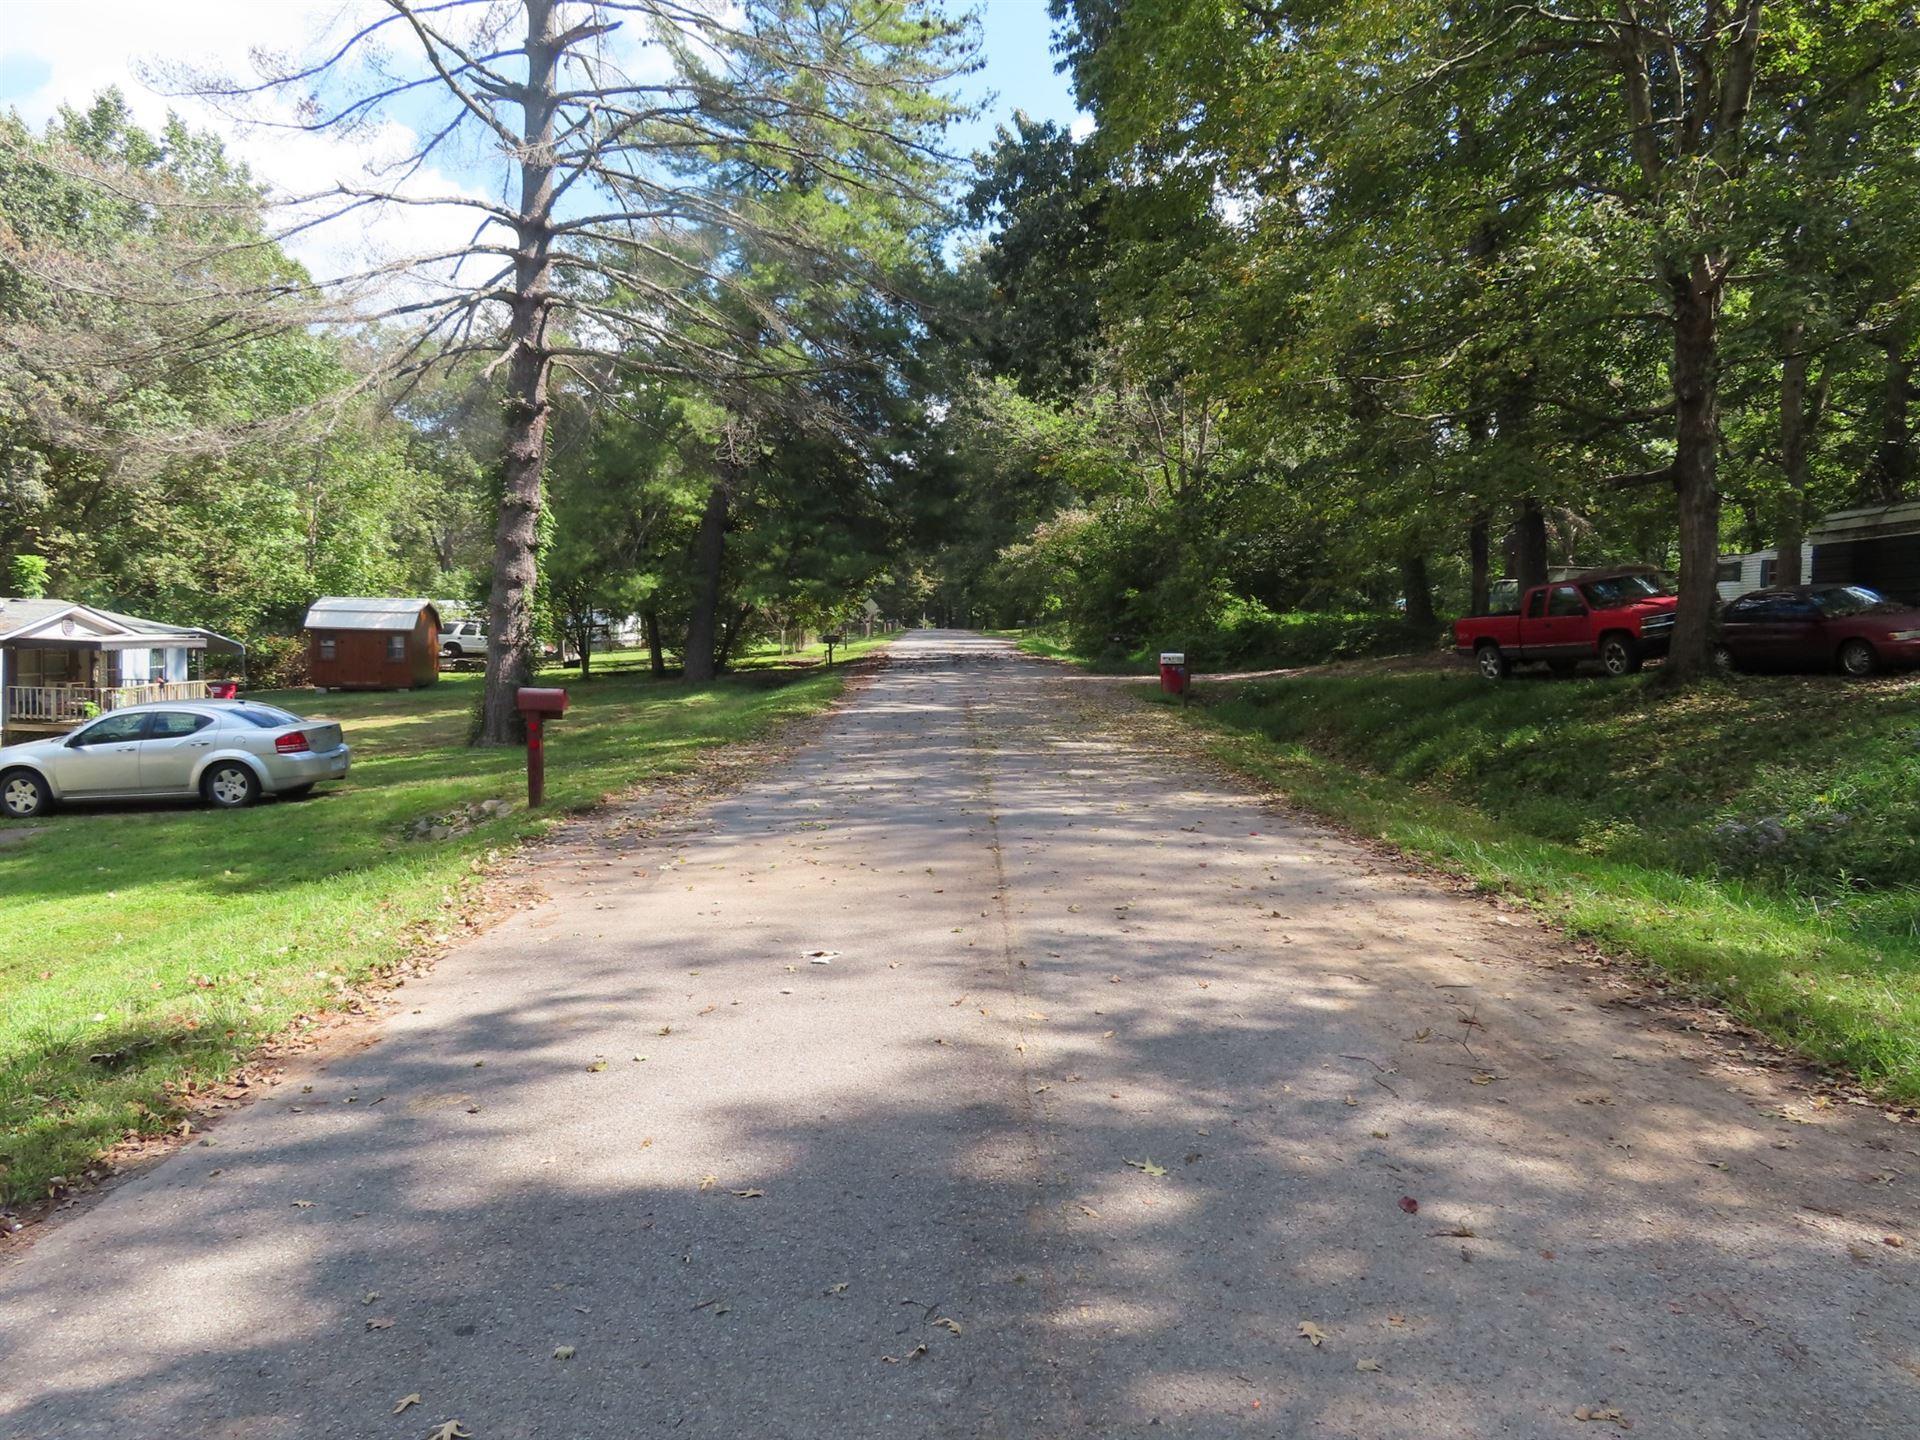 Photo of 916 Hilltop Ct, Clarksville, TN 37042 (MLS # 2295232)